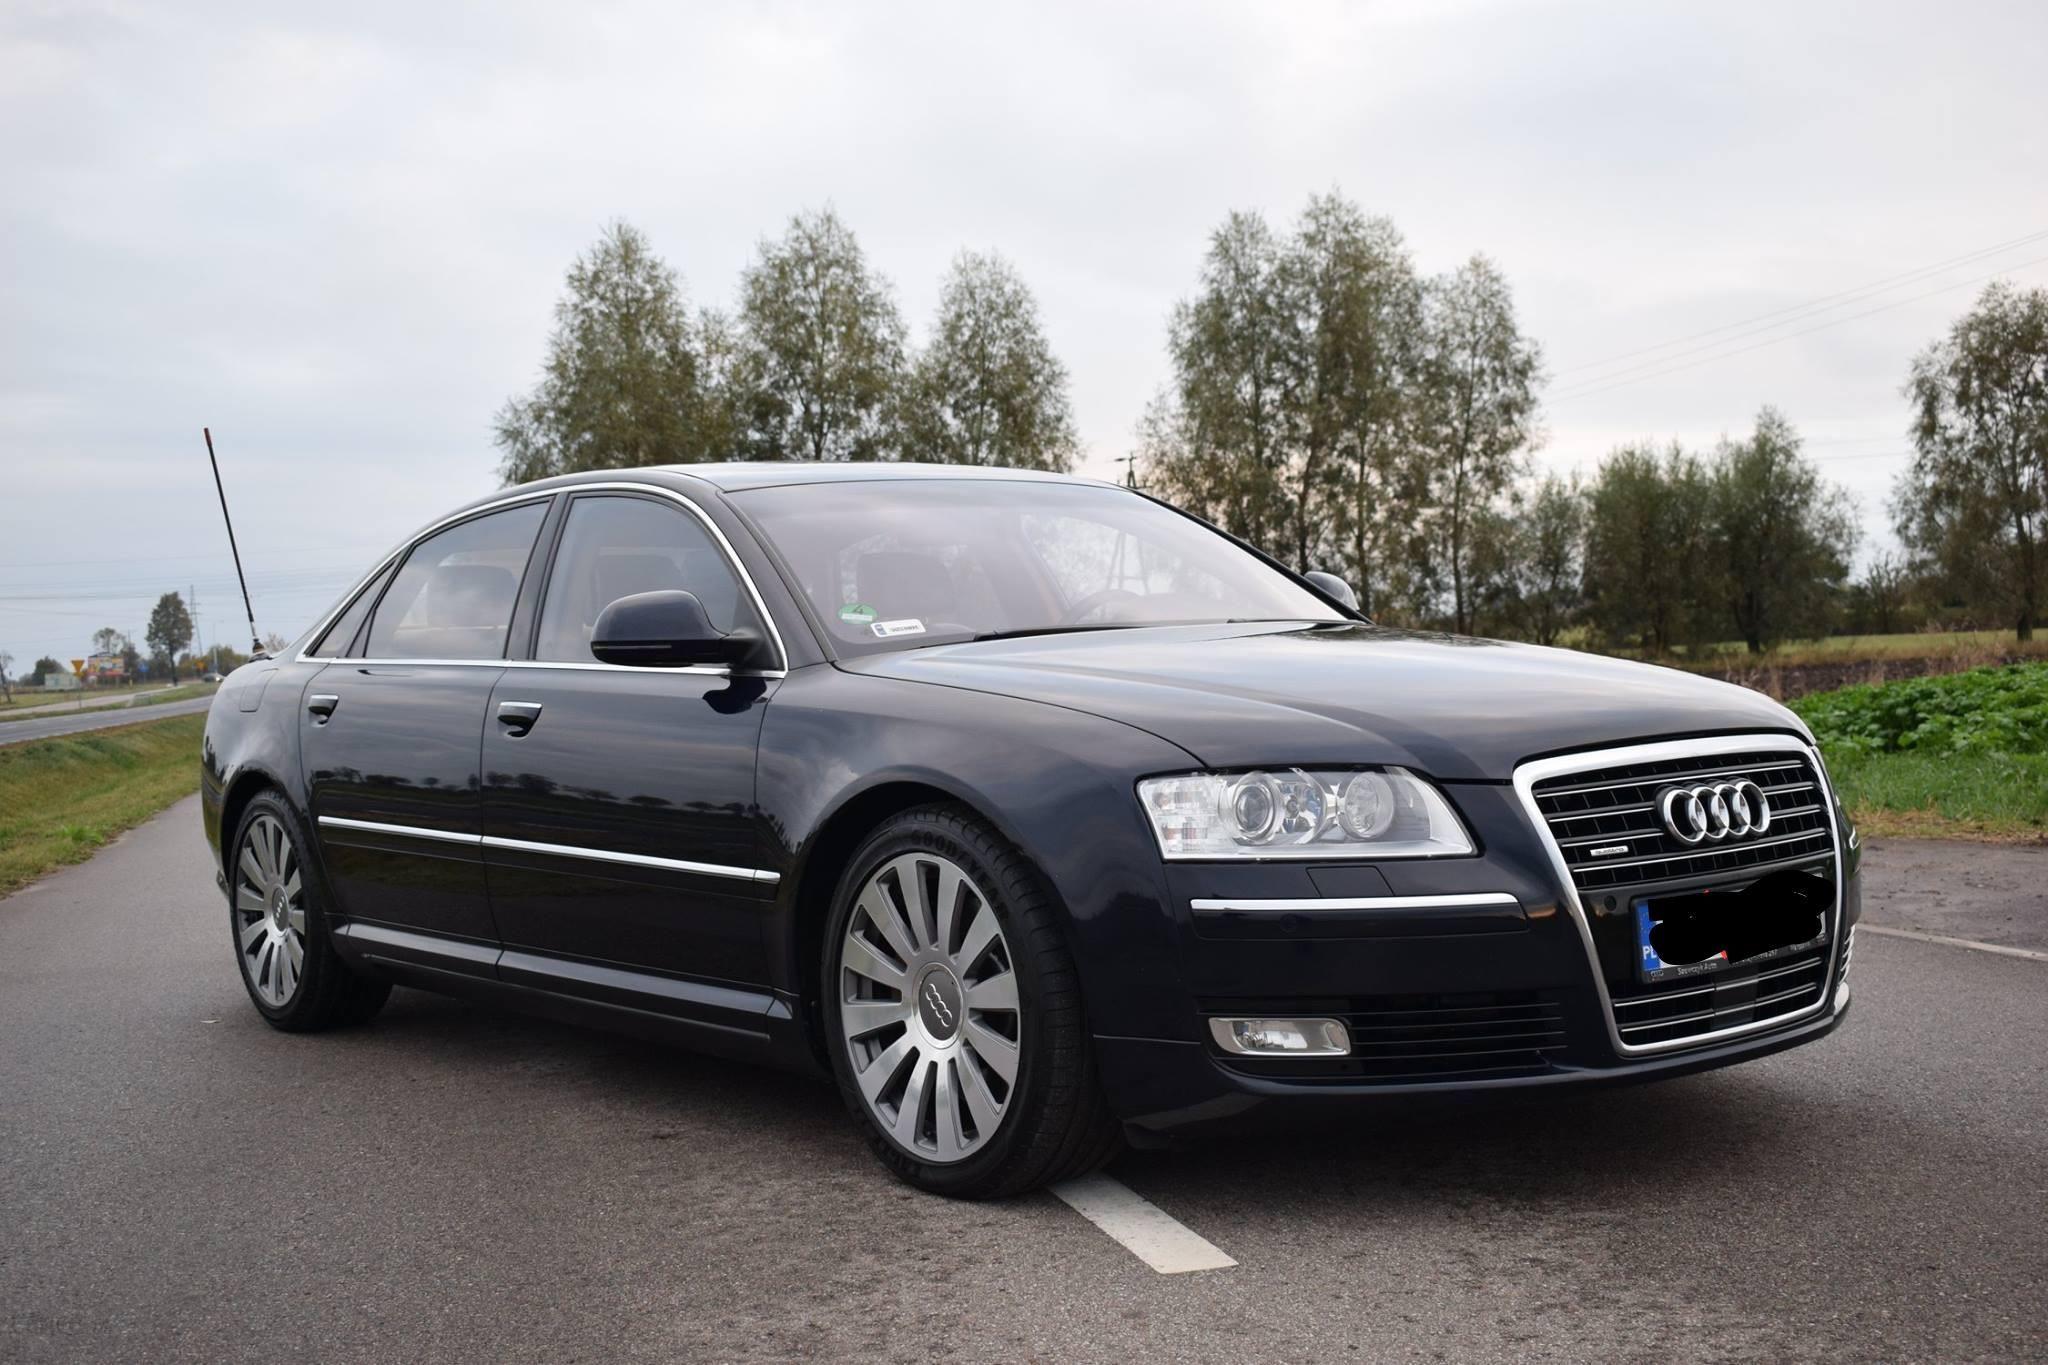 Audi A8 D3 2008 diesel 326KM sedan inny - Opinie i ceny na ...